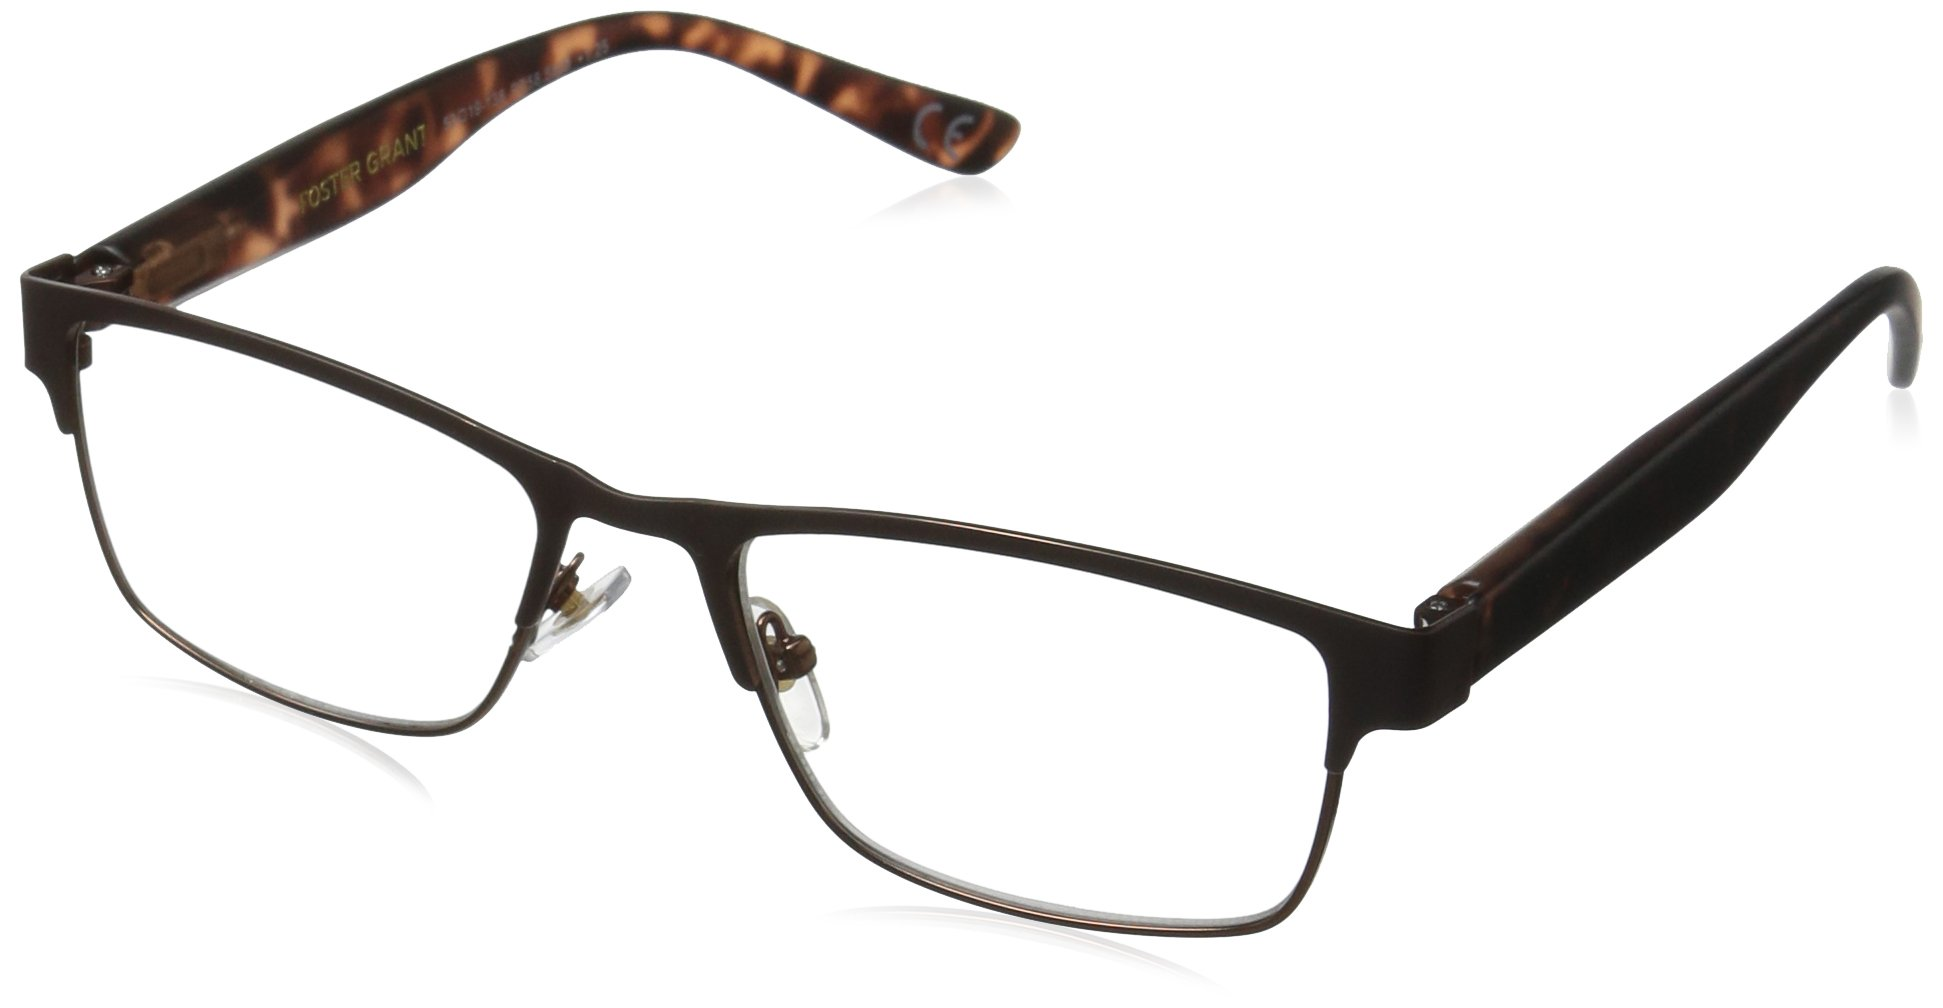 Foster Grant Men's Cormick 1017555-250.COM Wayfarer Reading Glasses, Brown, 2.5